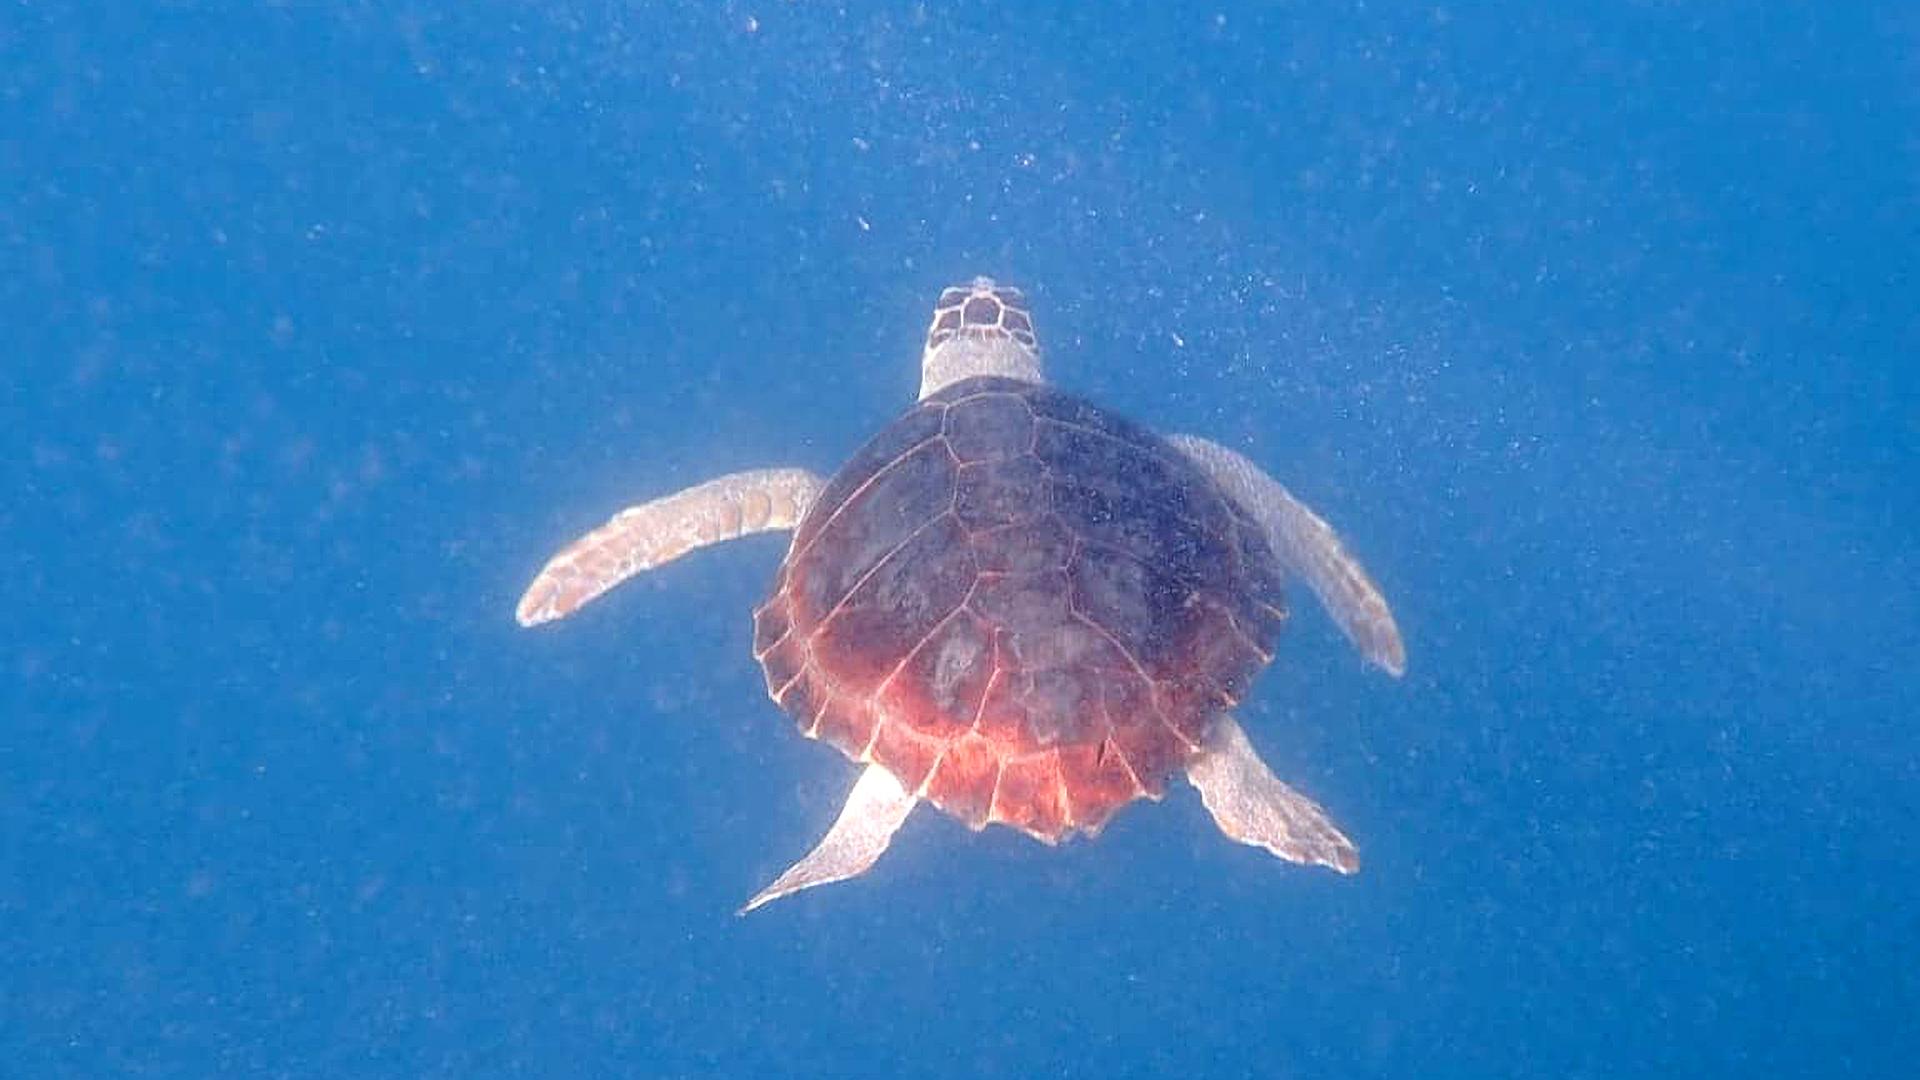 VIDEO: Net You Again! Sea Turtle Eleonora Saved From Fishermen's Tackle Twice